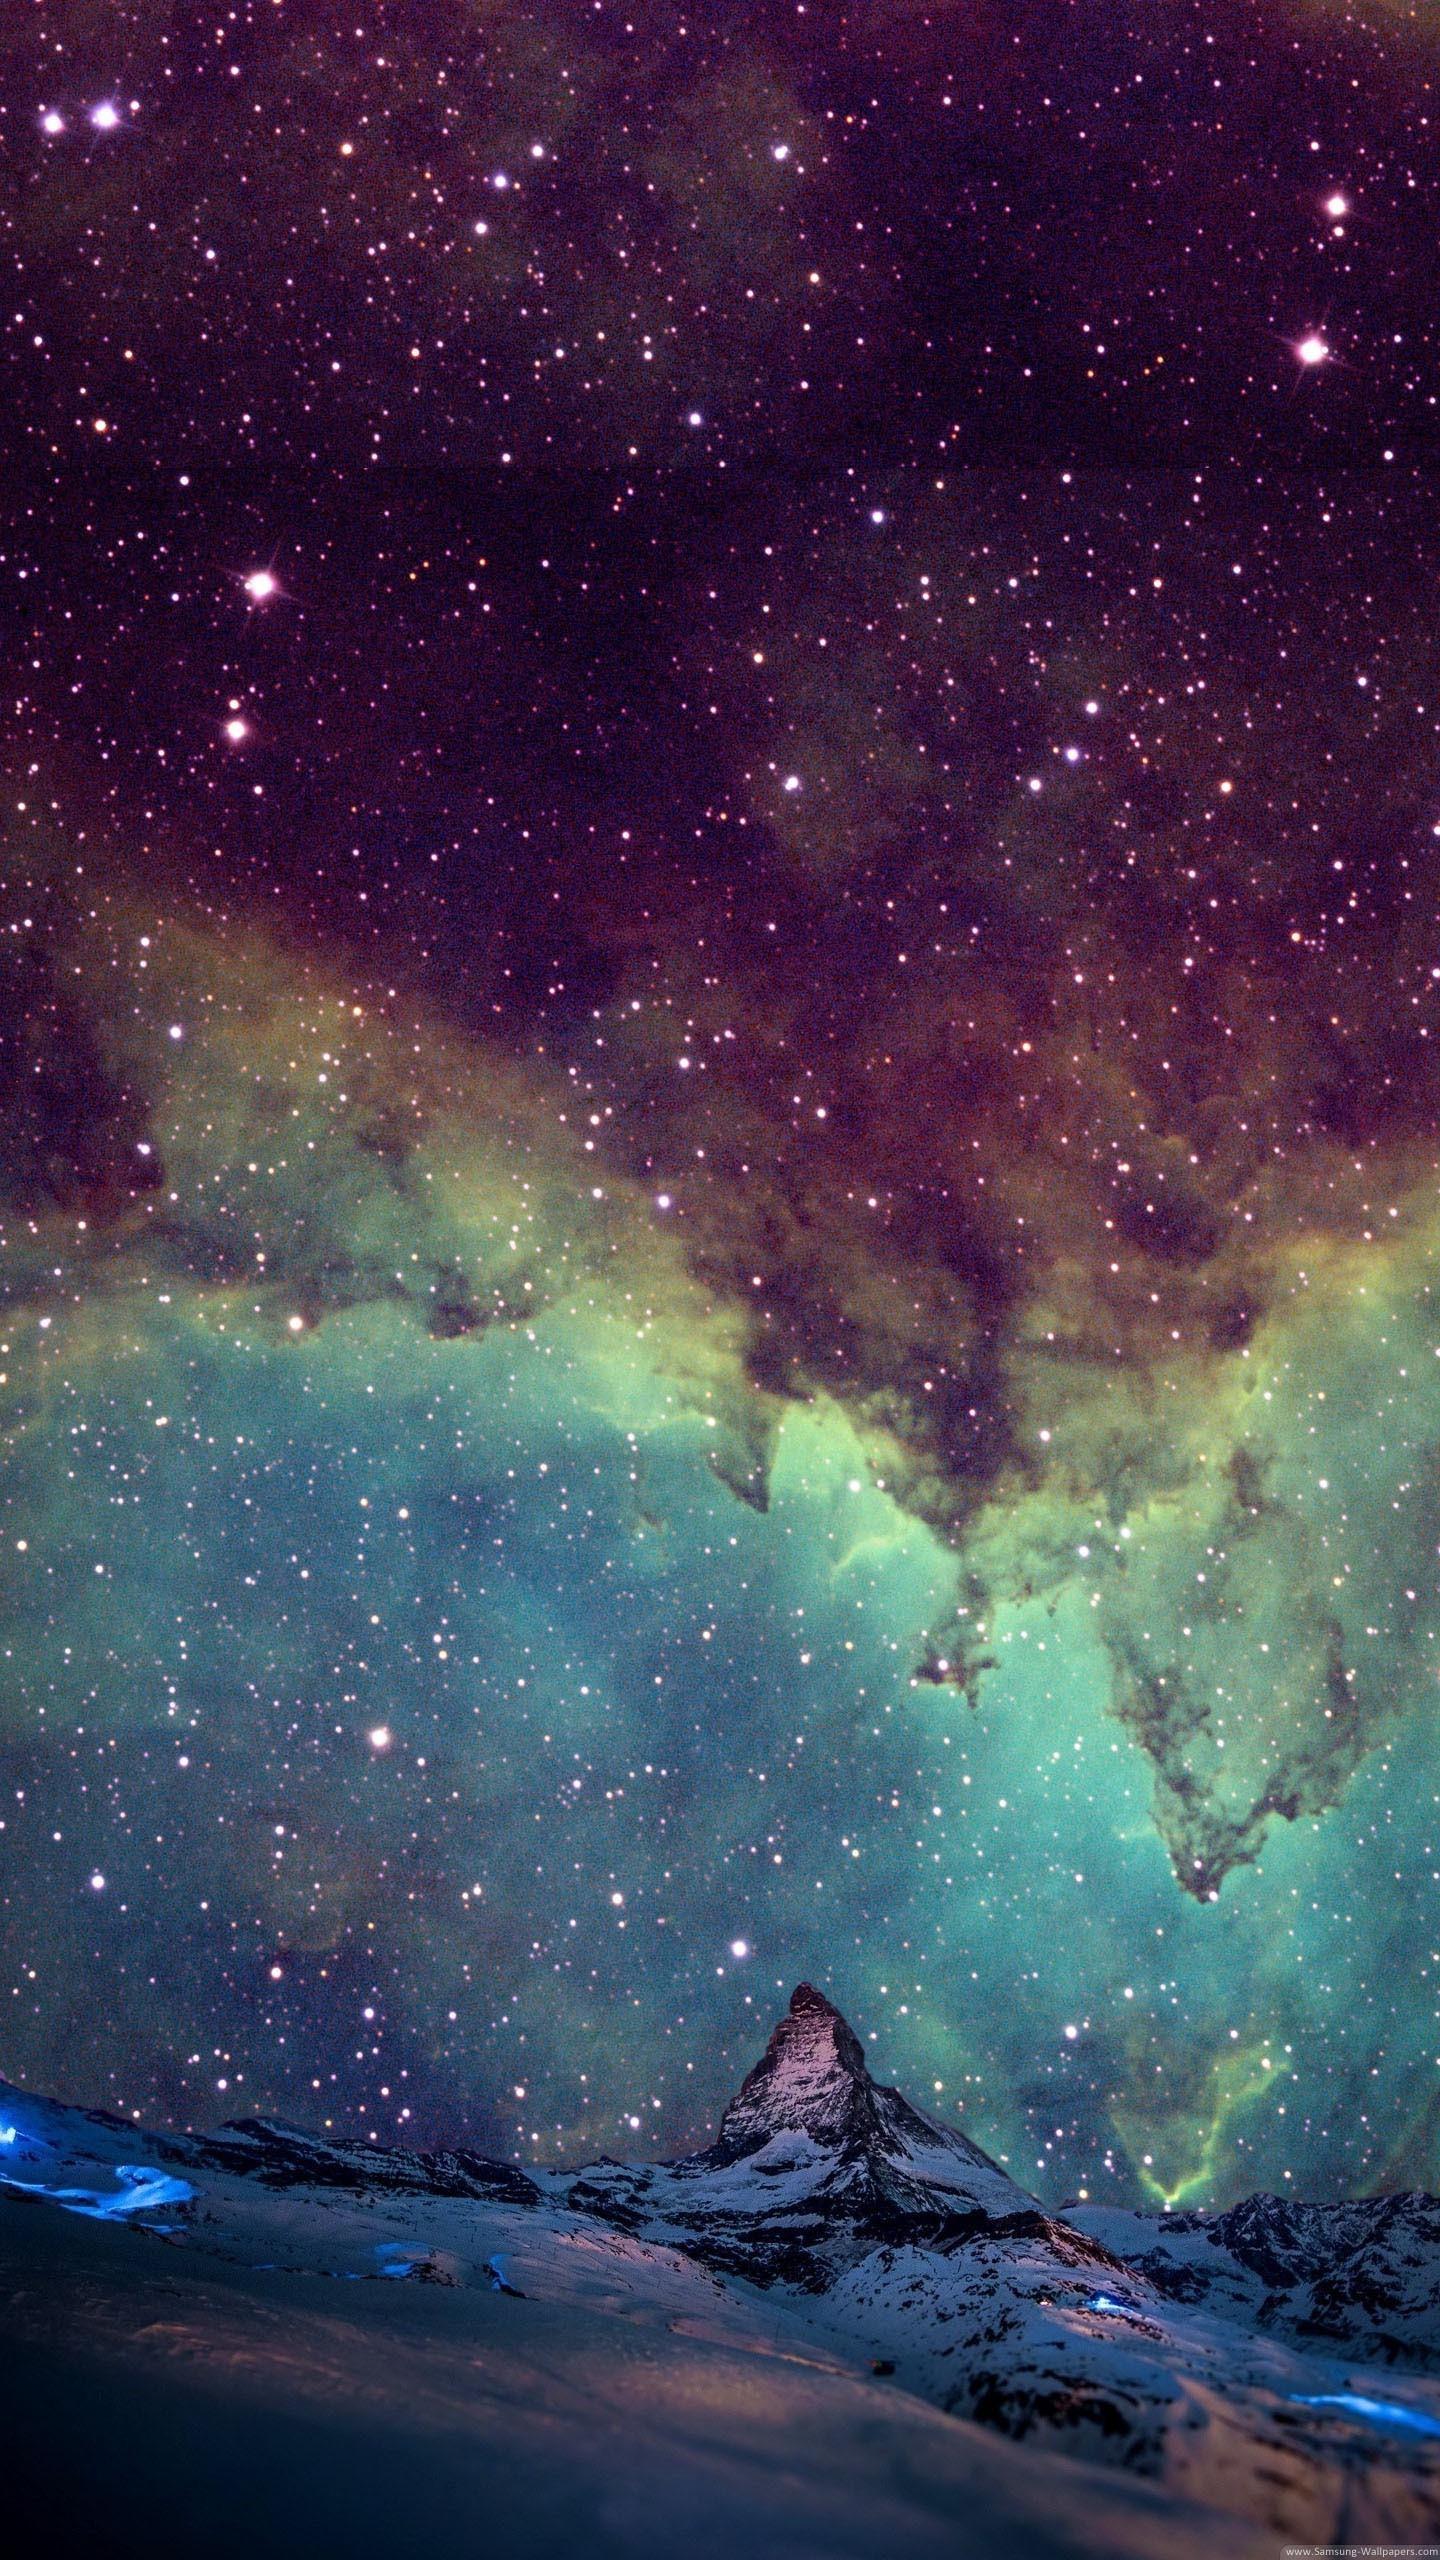 Free wallpaper for Galaxy S6 #stars #galaxy #phone wallpaper